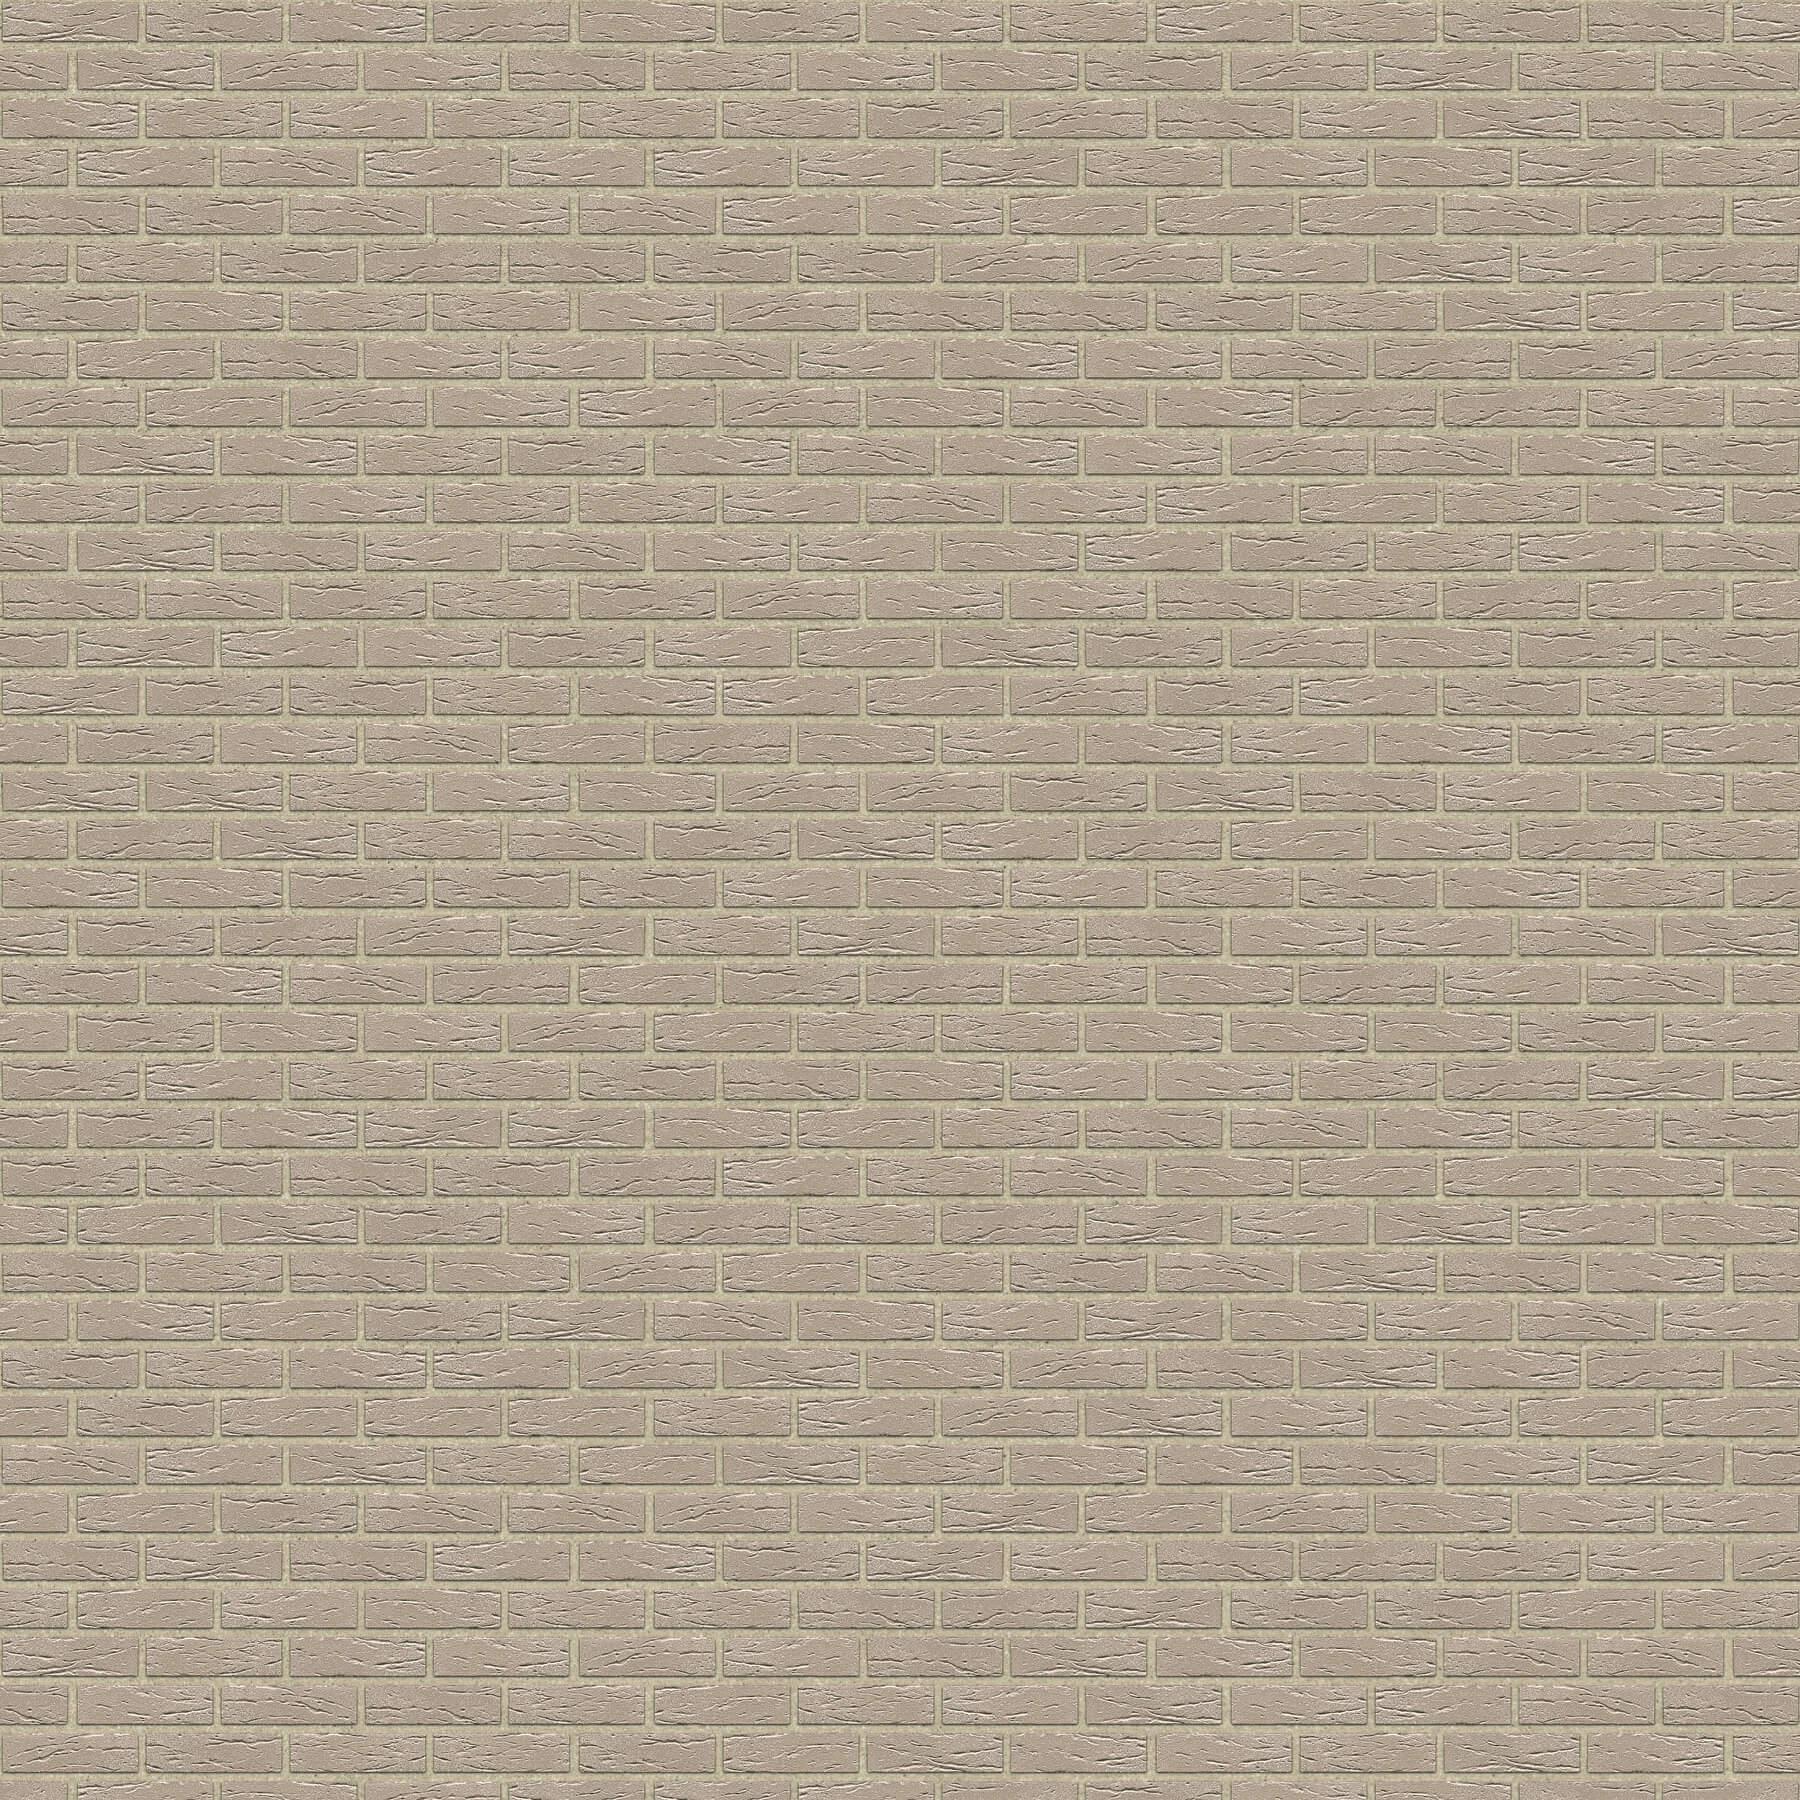 Dekorativna cigla listela FeldHaus Klinker r-835 nf Bez Fuga